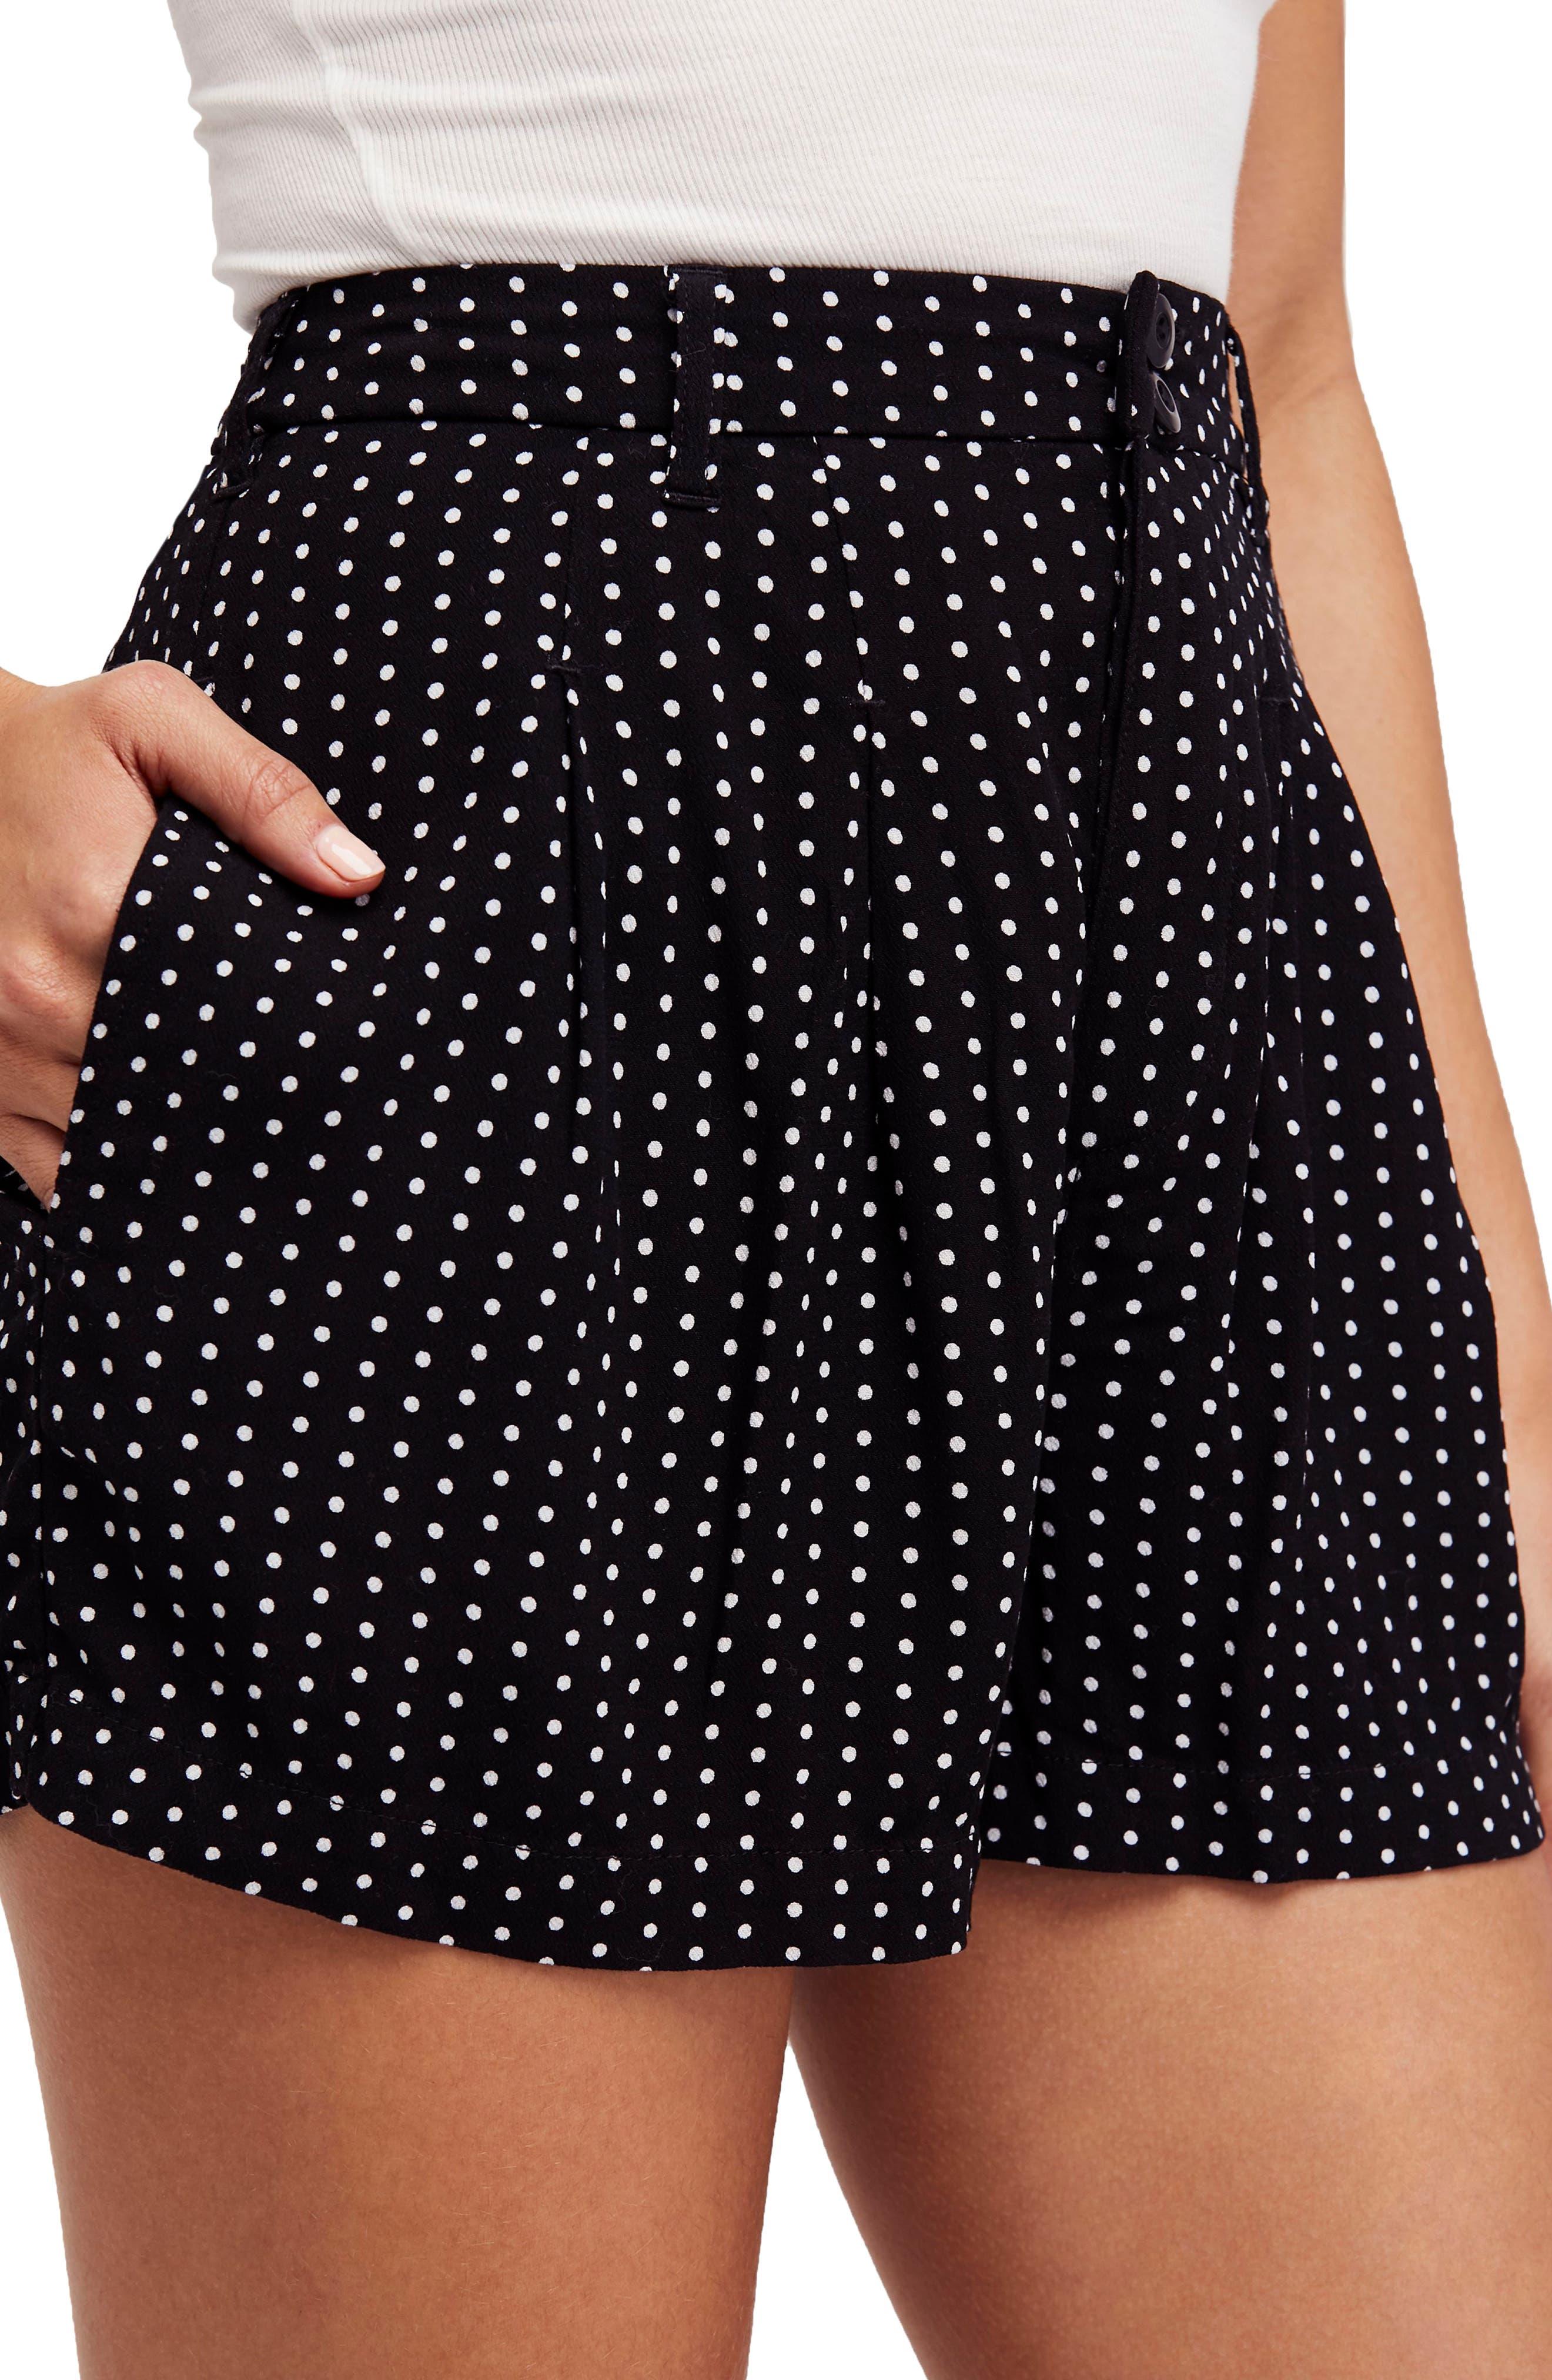 Main Image - Free People Magdalene Polka Dot Pleated Shorts